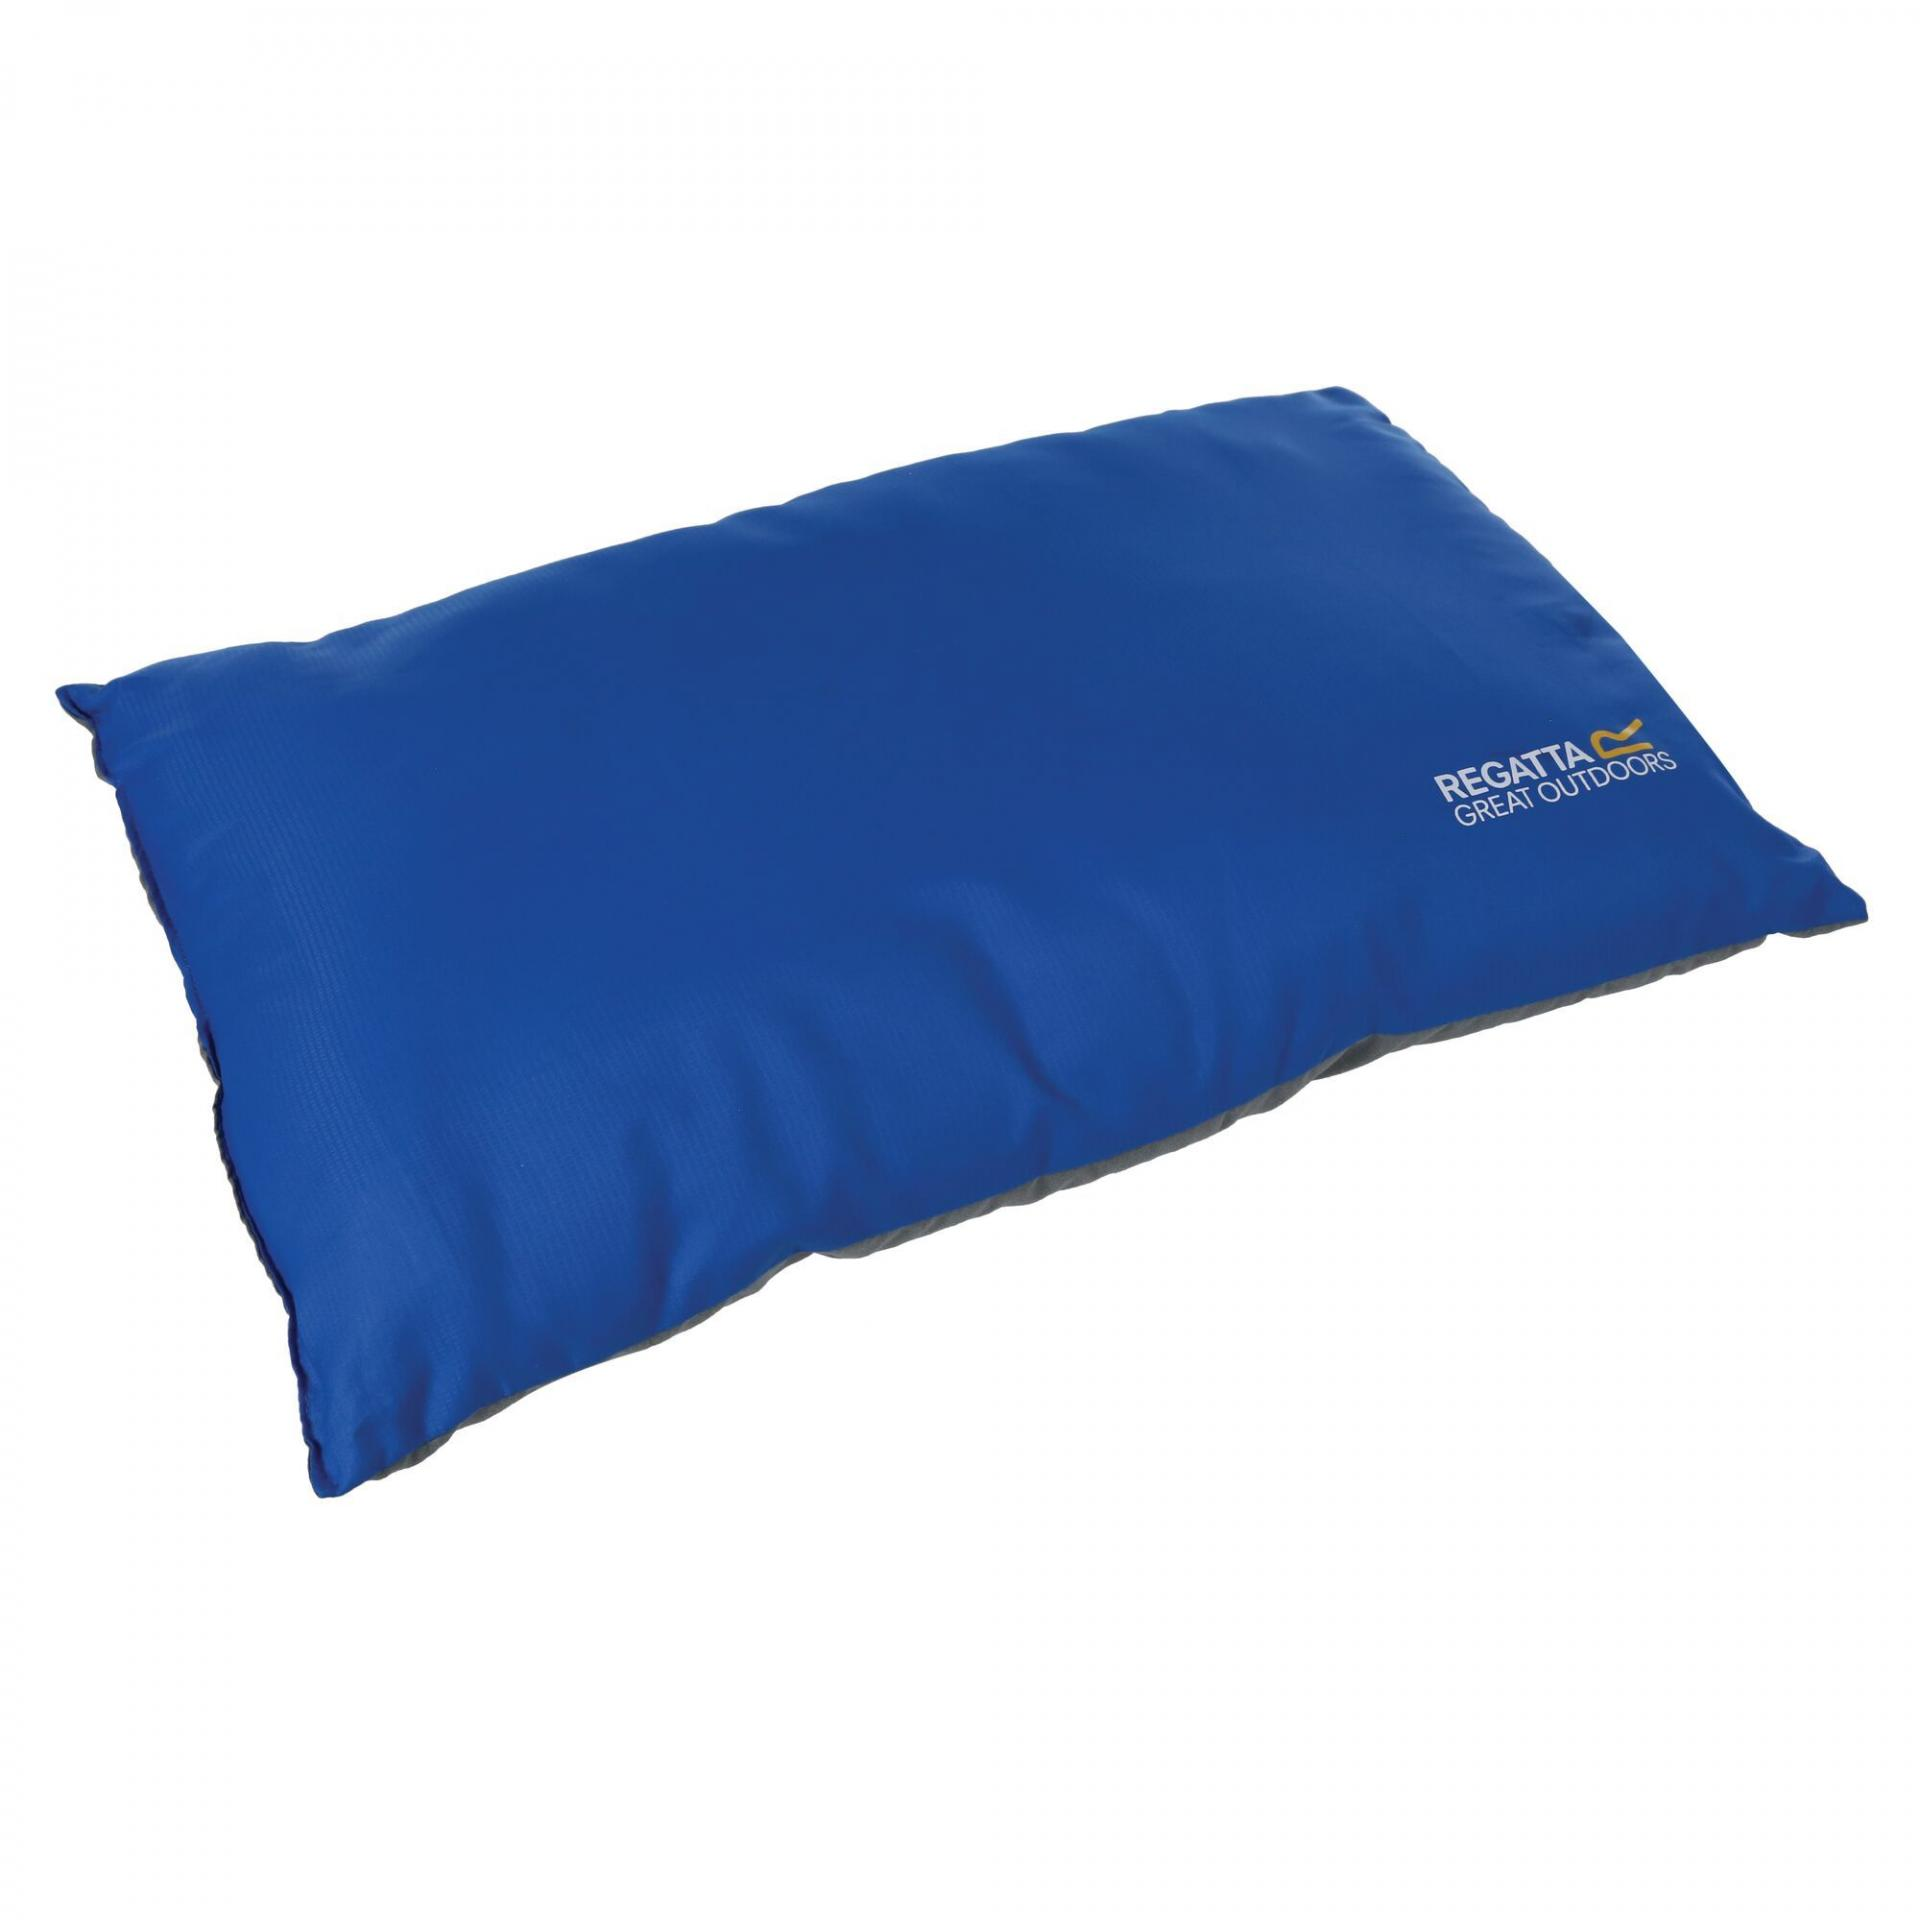 Almohada Camping Regatta Pillow. Oxford Blue. RCE272